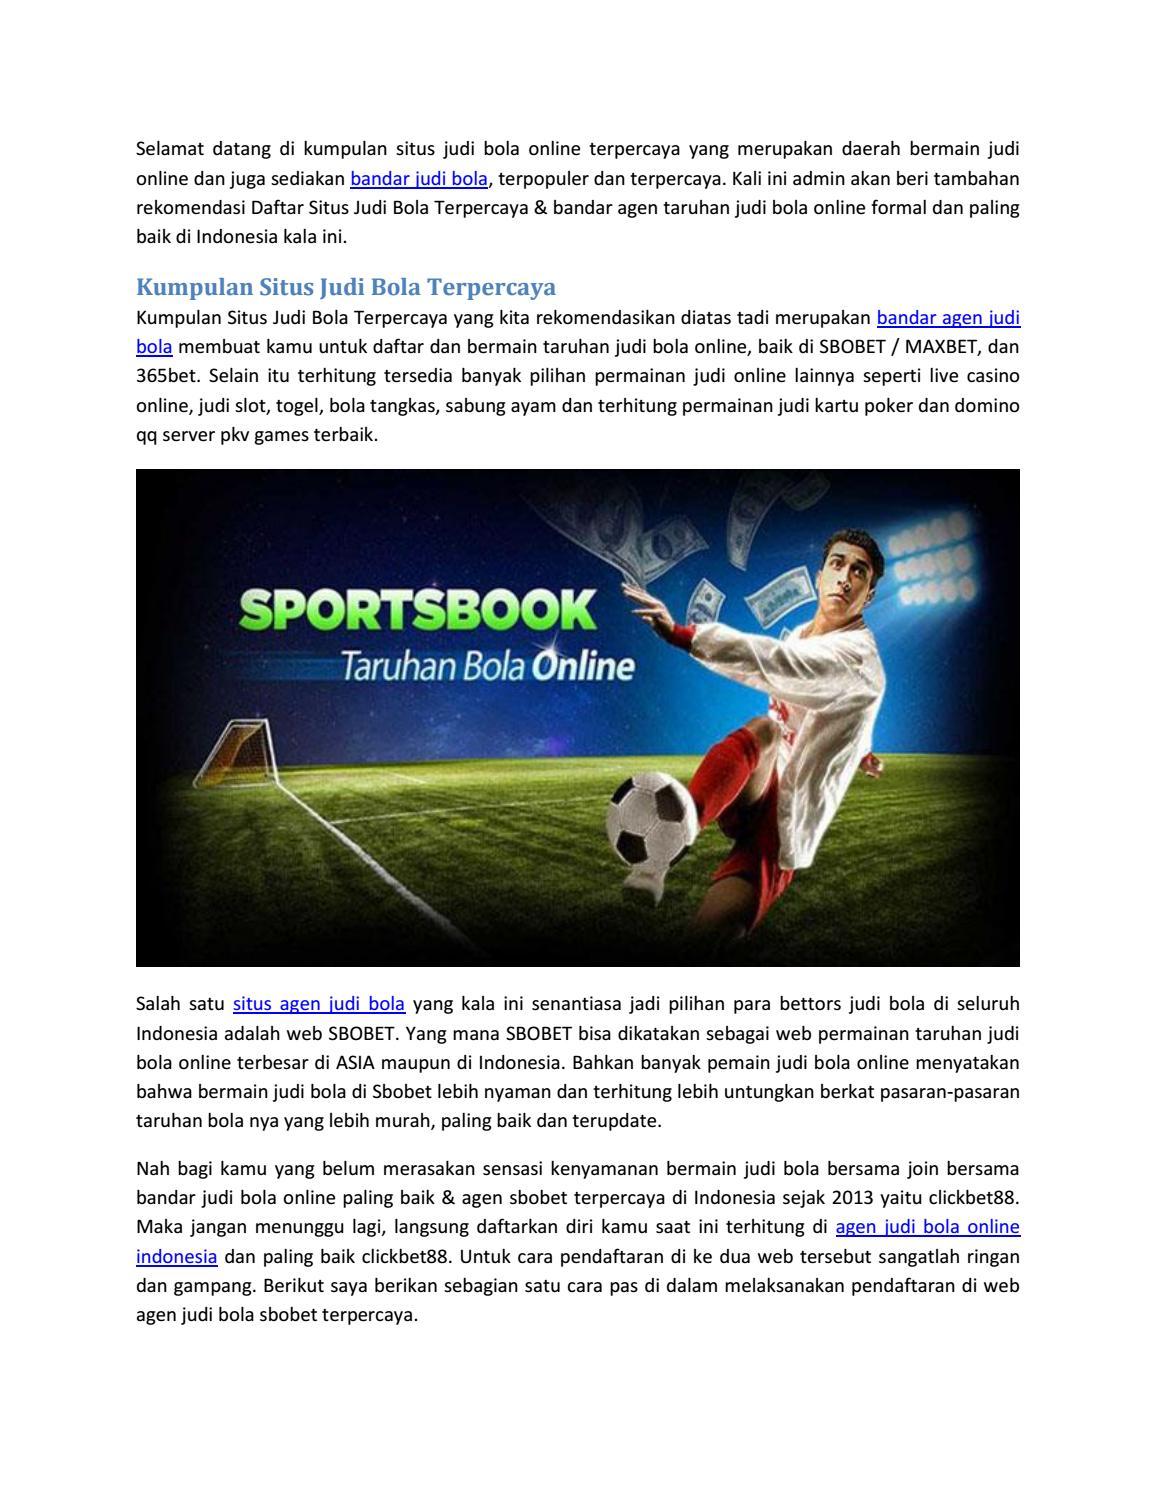 Kumpulan Situs Judi Bola Terpercaya By Bandar Agen Judi Bola Issuu